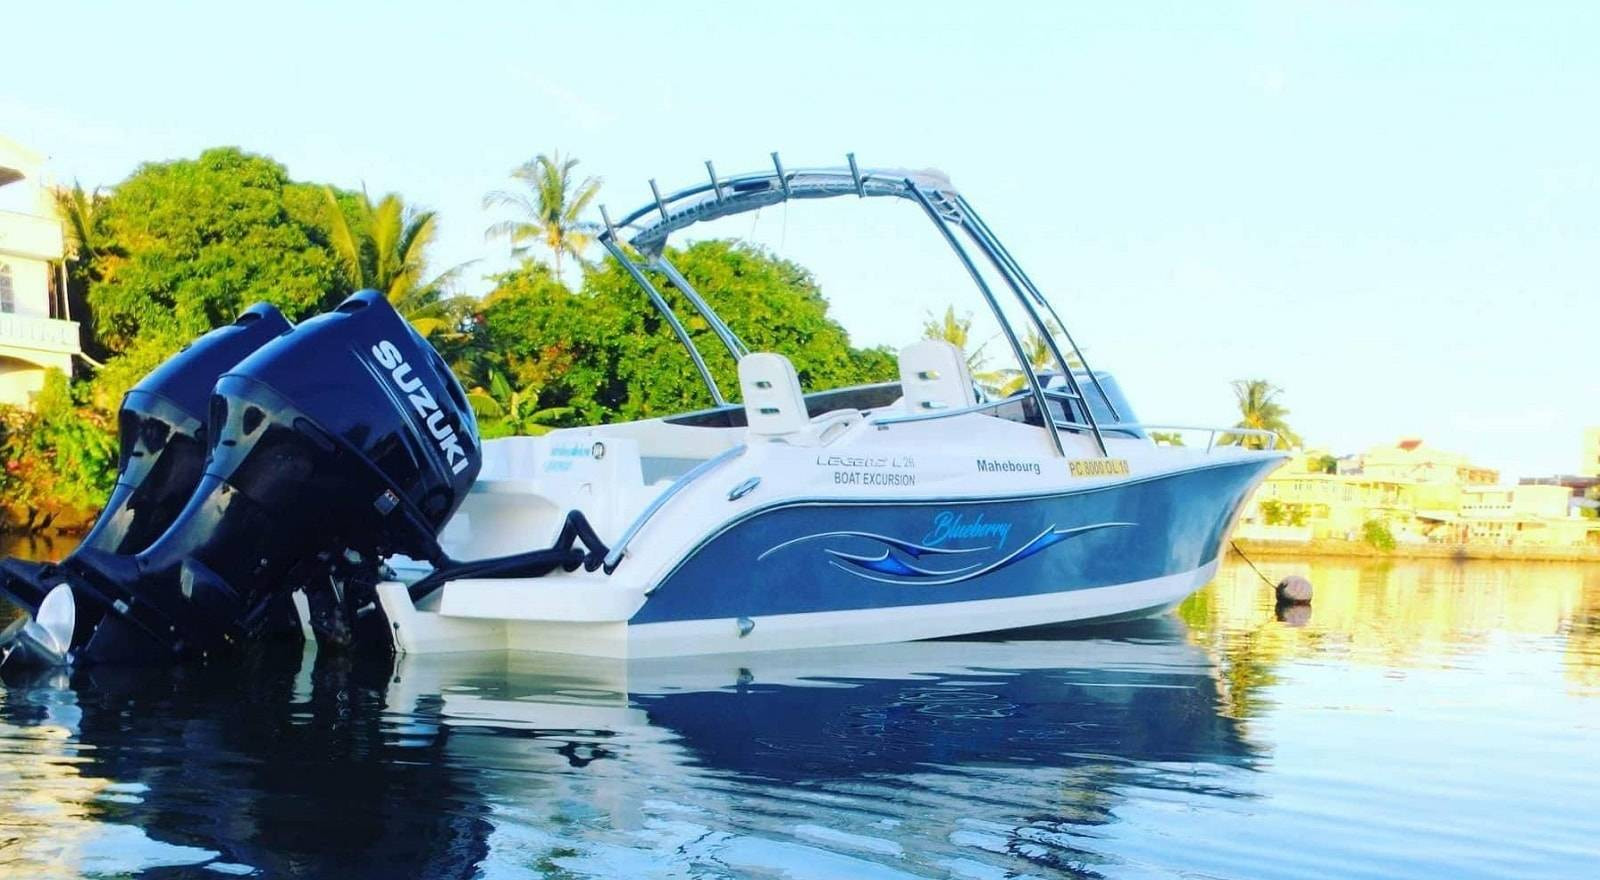 Speedboat Sunset Cruise South, Speedboat Sunset Cruise South, Speedboat Sunset Cruise South